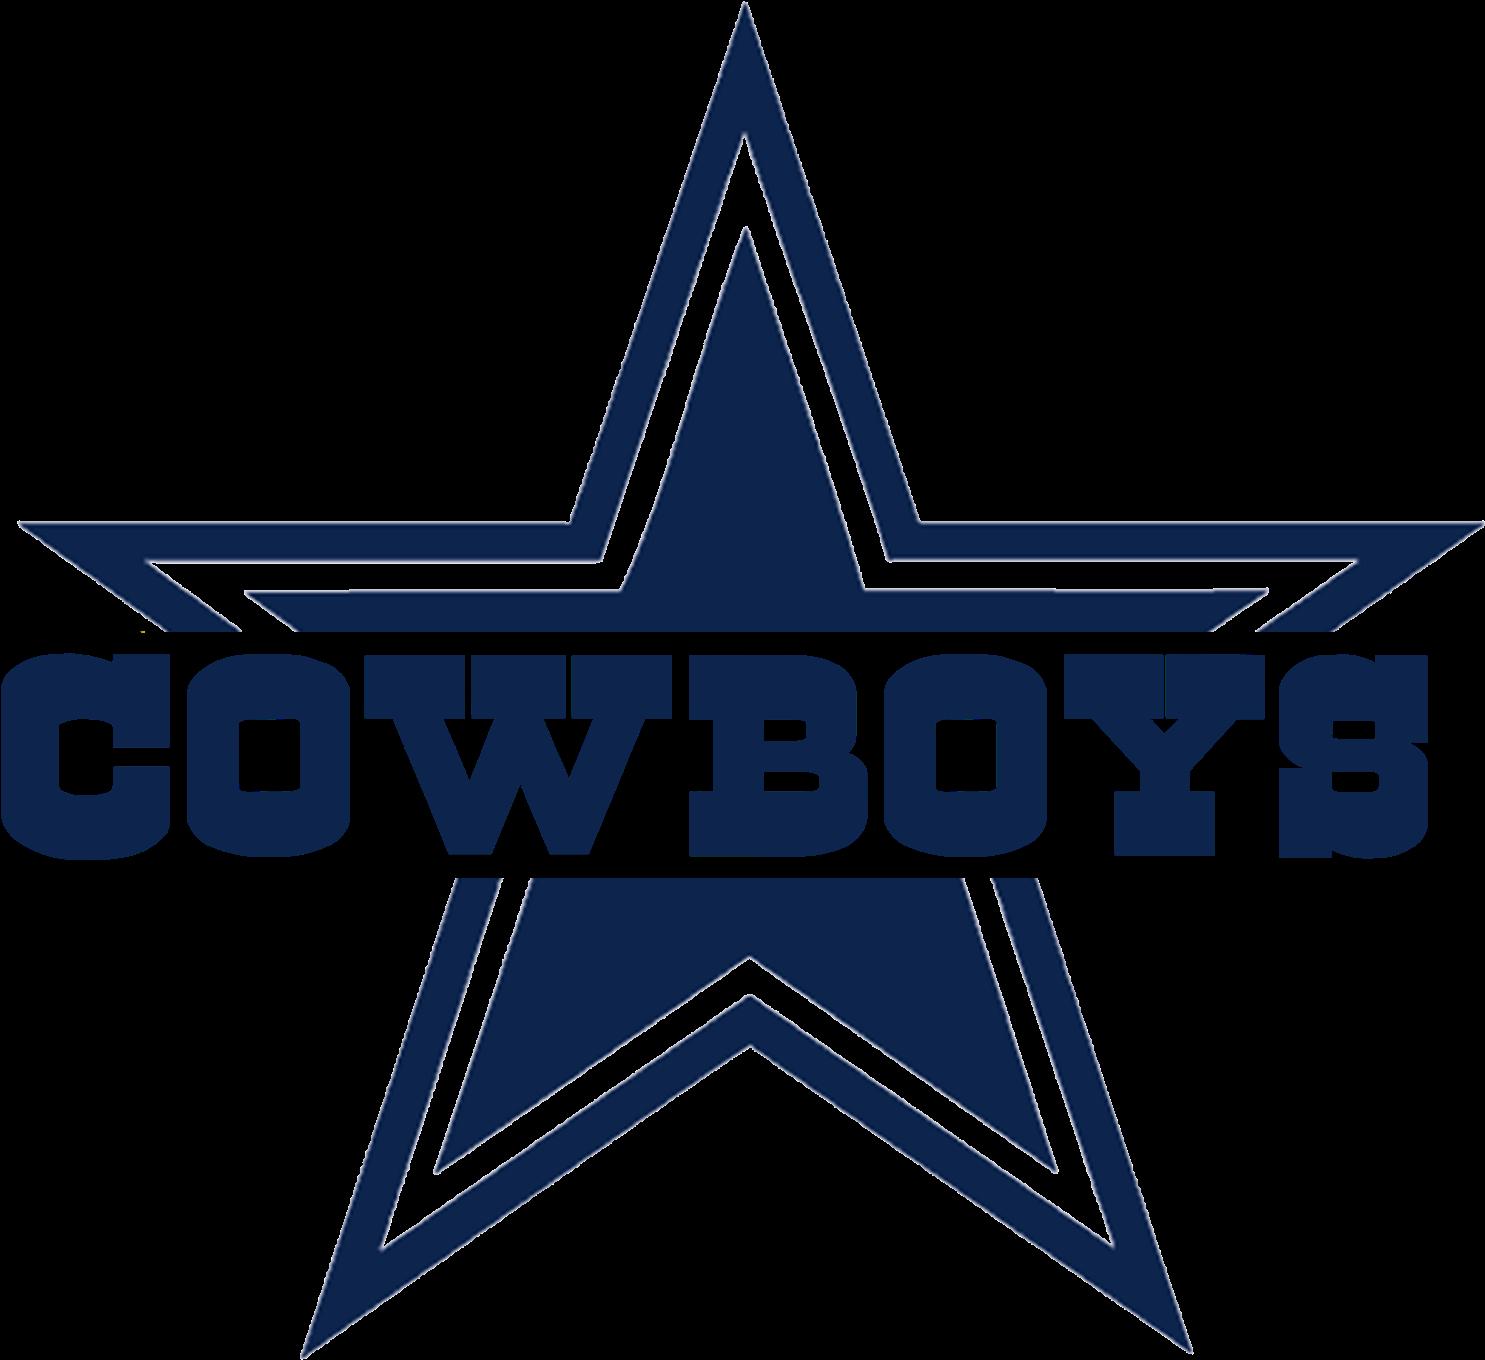 Cowboys Logo Png - Dallas Cowboys , Transparent Cartoon ...